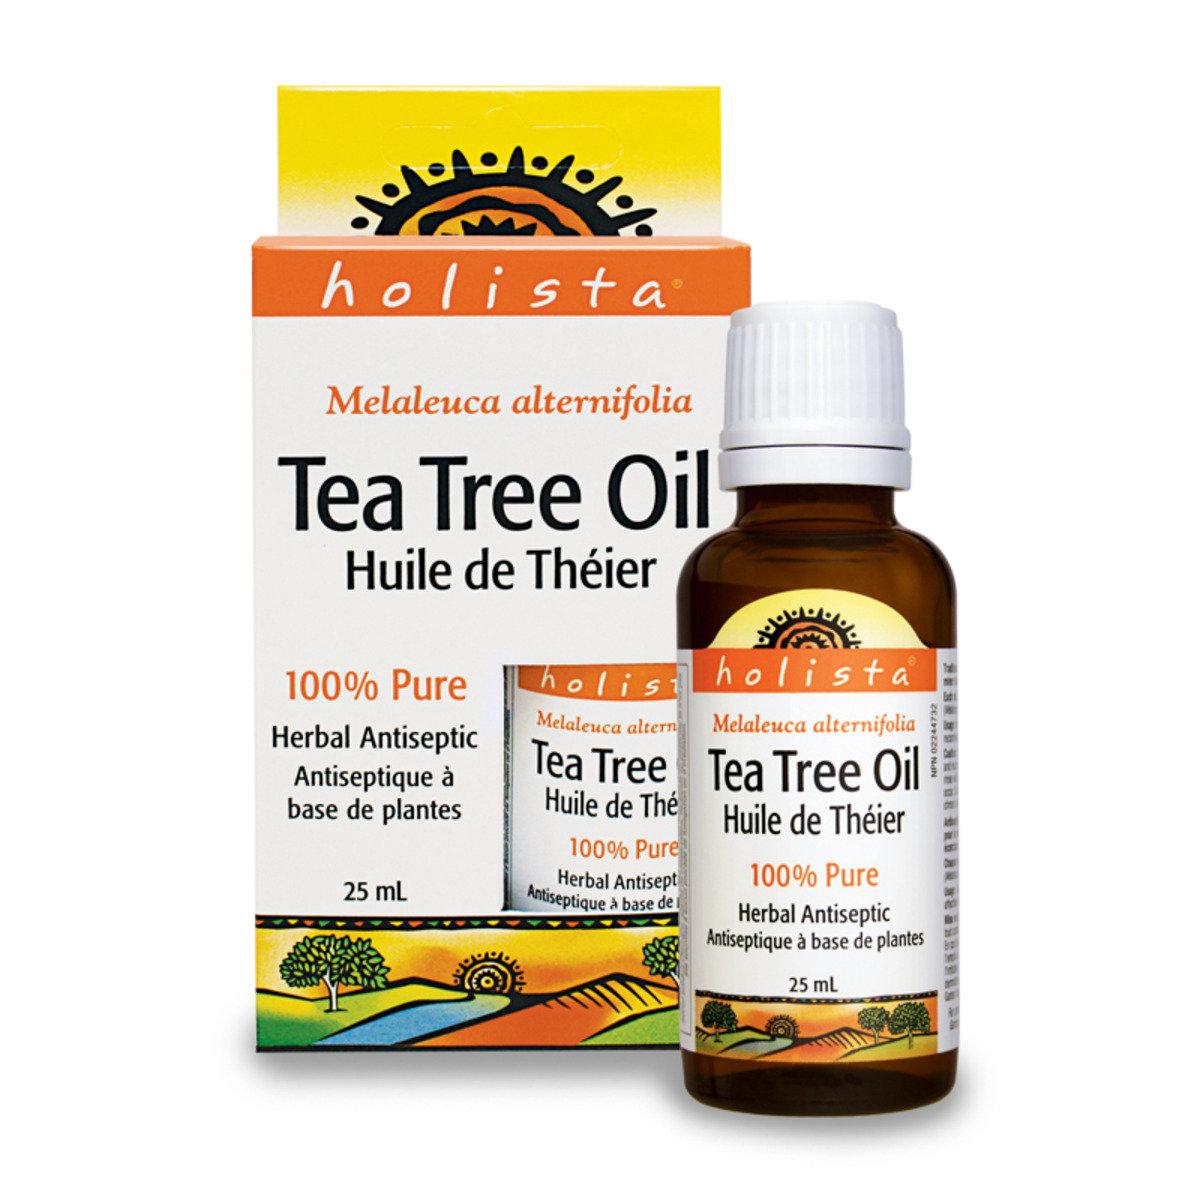 全效TTO茶樹油